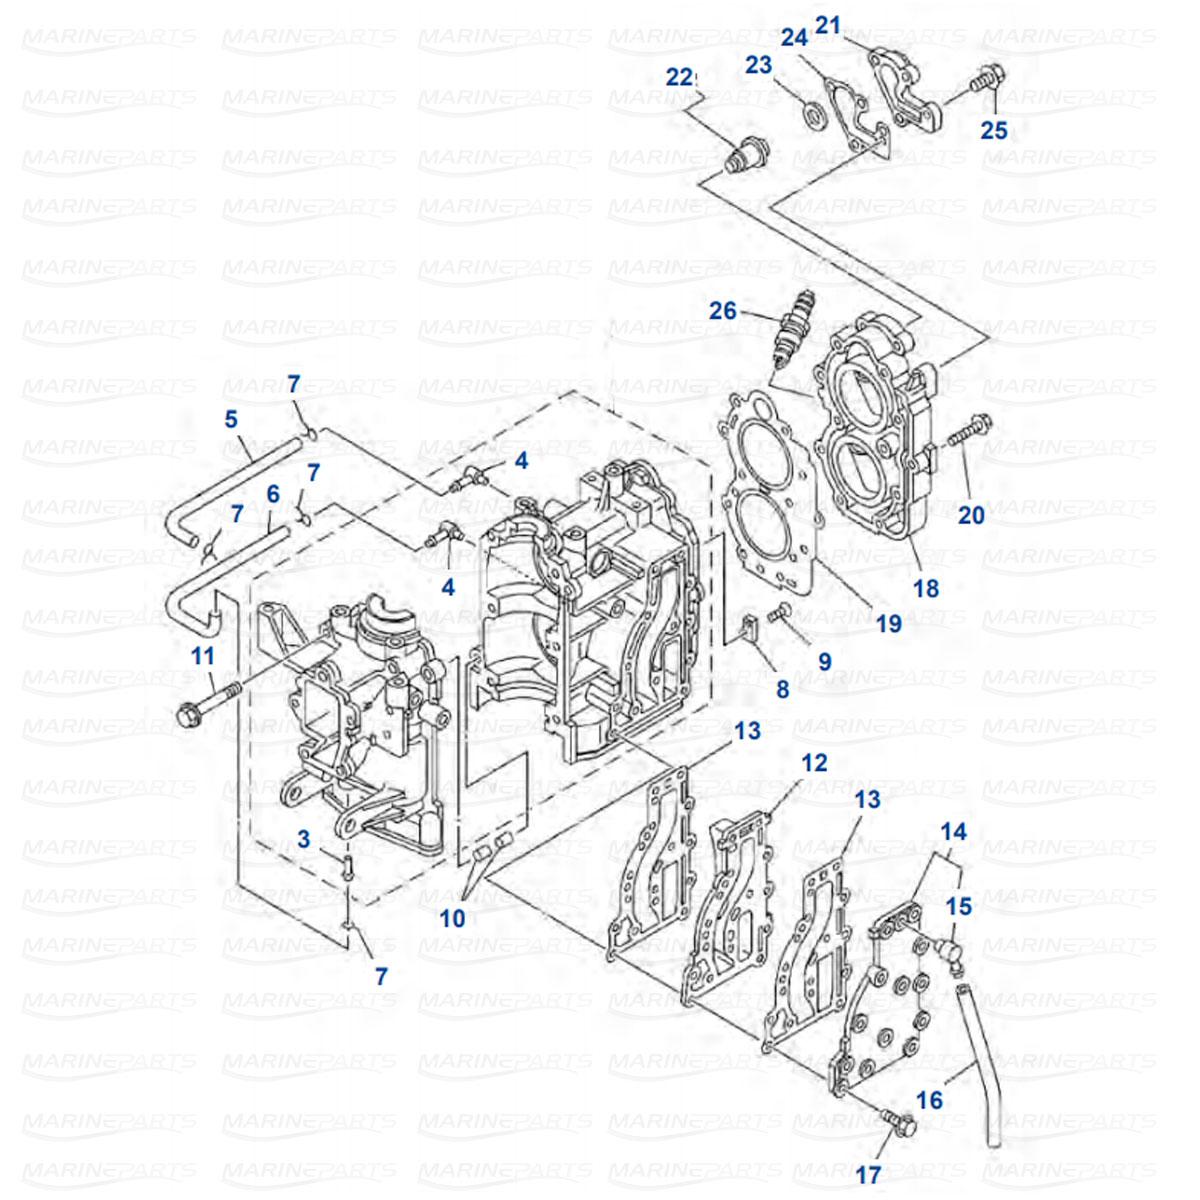 Engine Parts Yamaha 9.9F - 15F - E9.9C - E15C